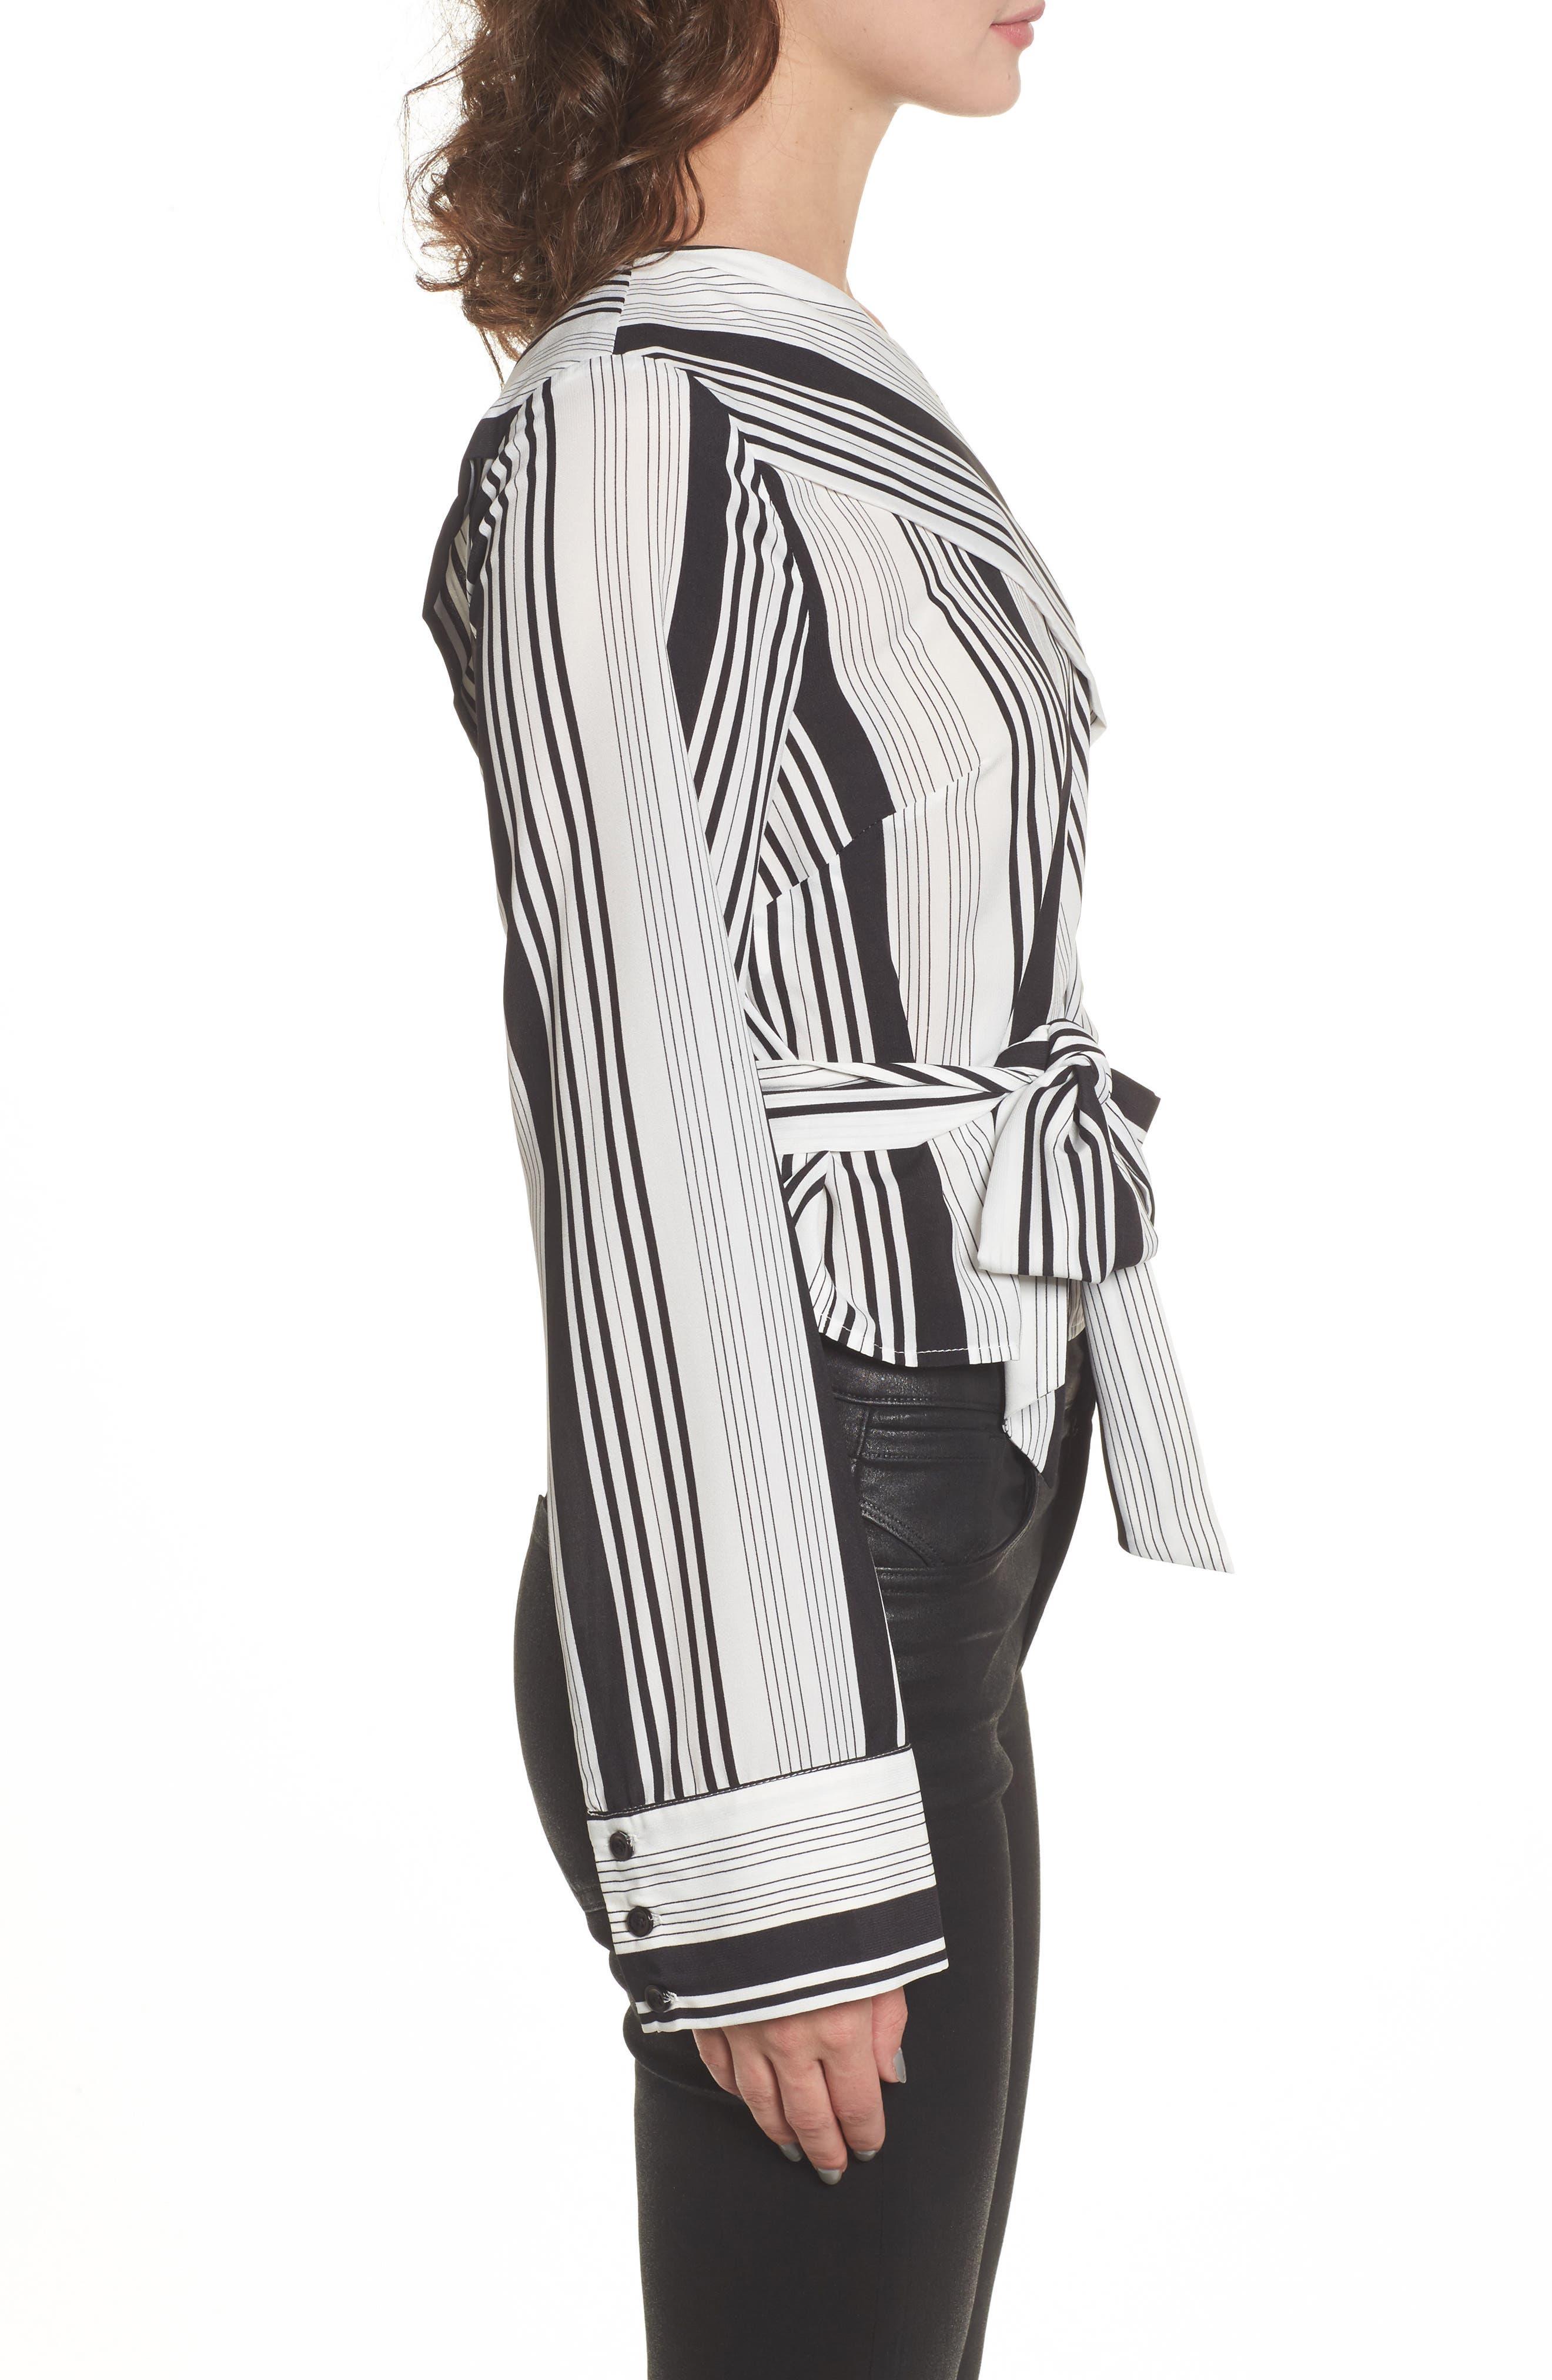 One-Shoulder Tie Waist Shirt,                             Alternate thumbnail 3, color,                             Black/ White Stripe